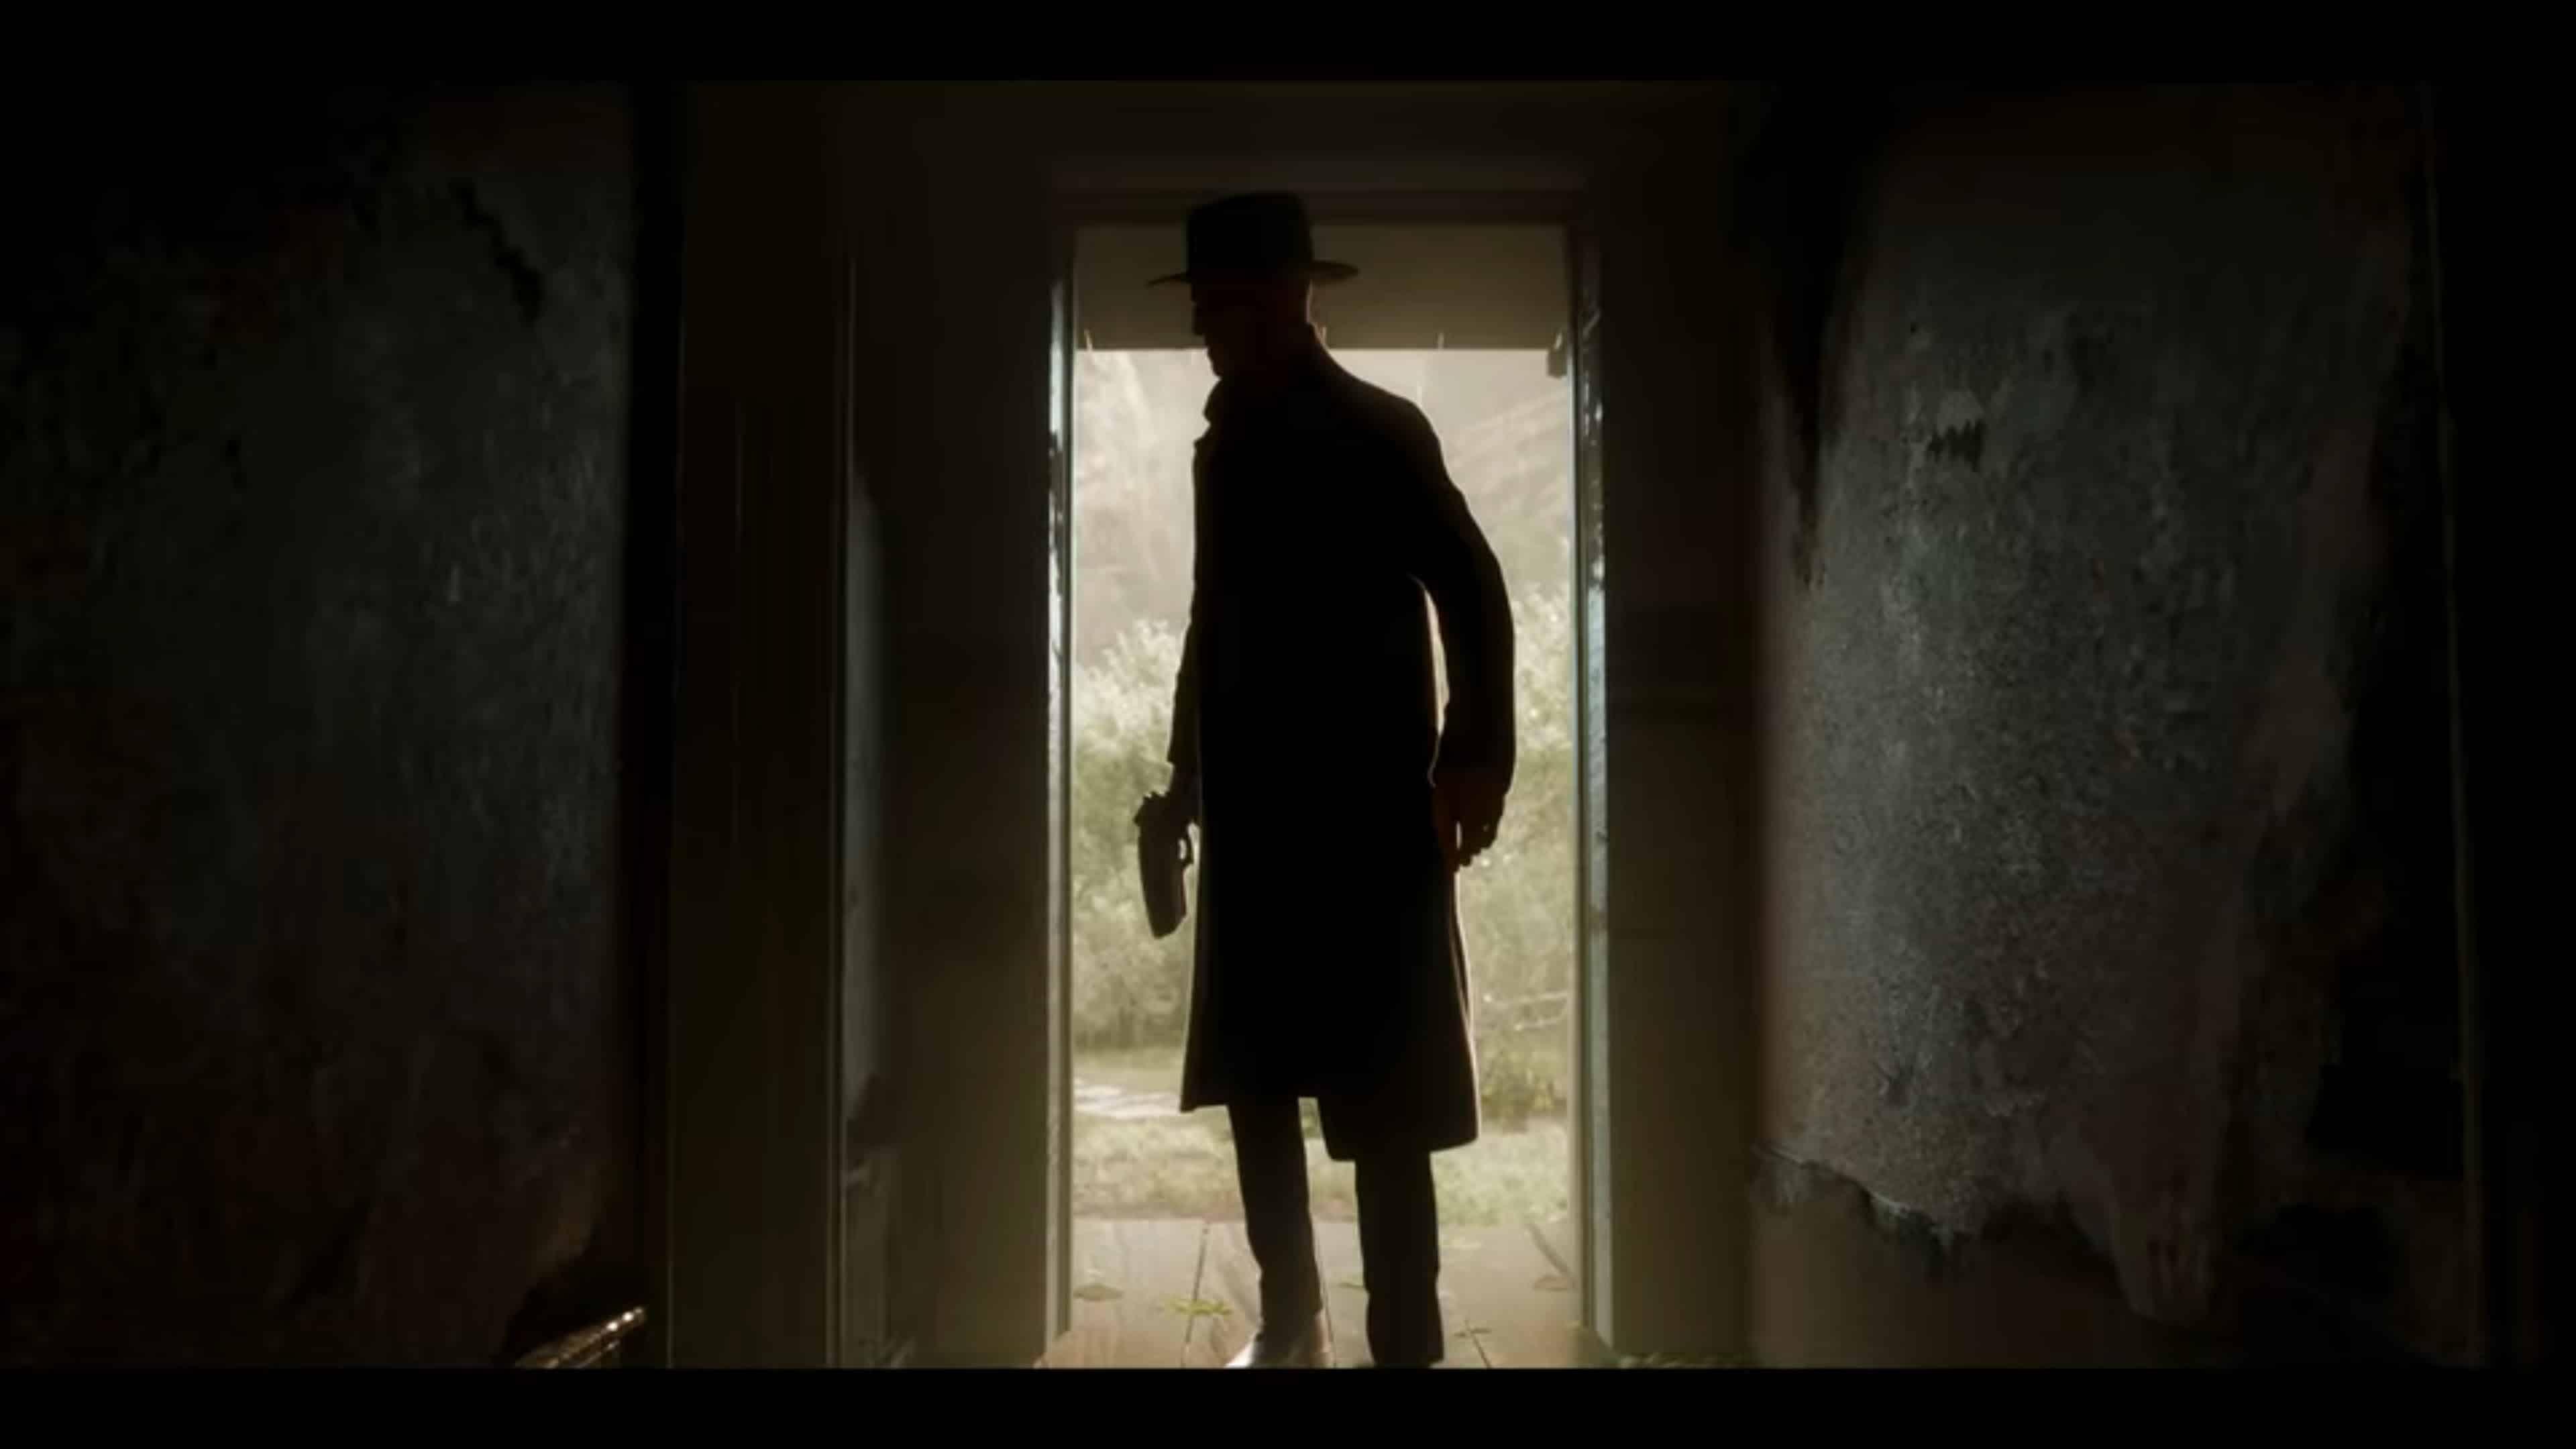 Detective Briggs entering someone's home